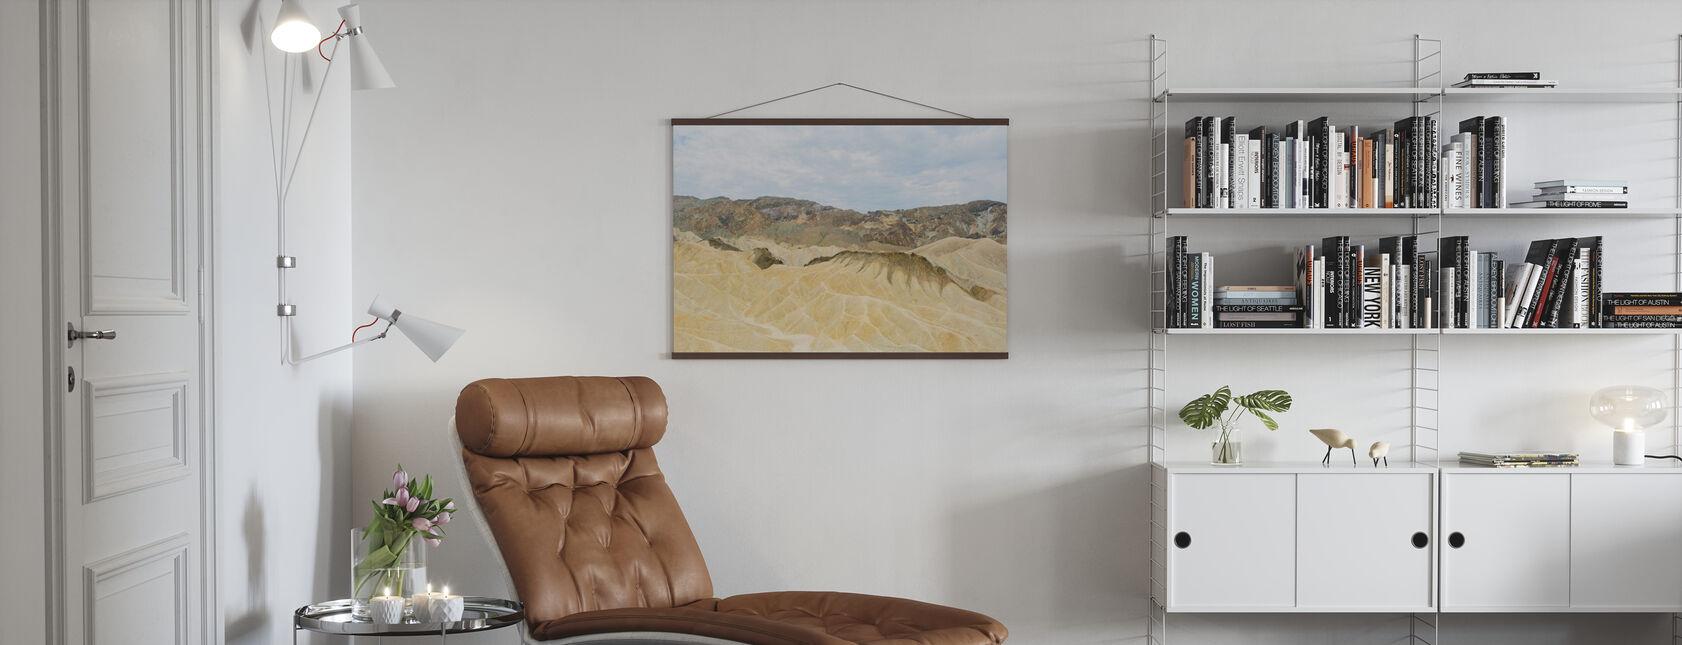 Death Valley nasjonalpark, California - Plakat - Stue